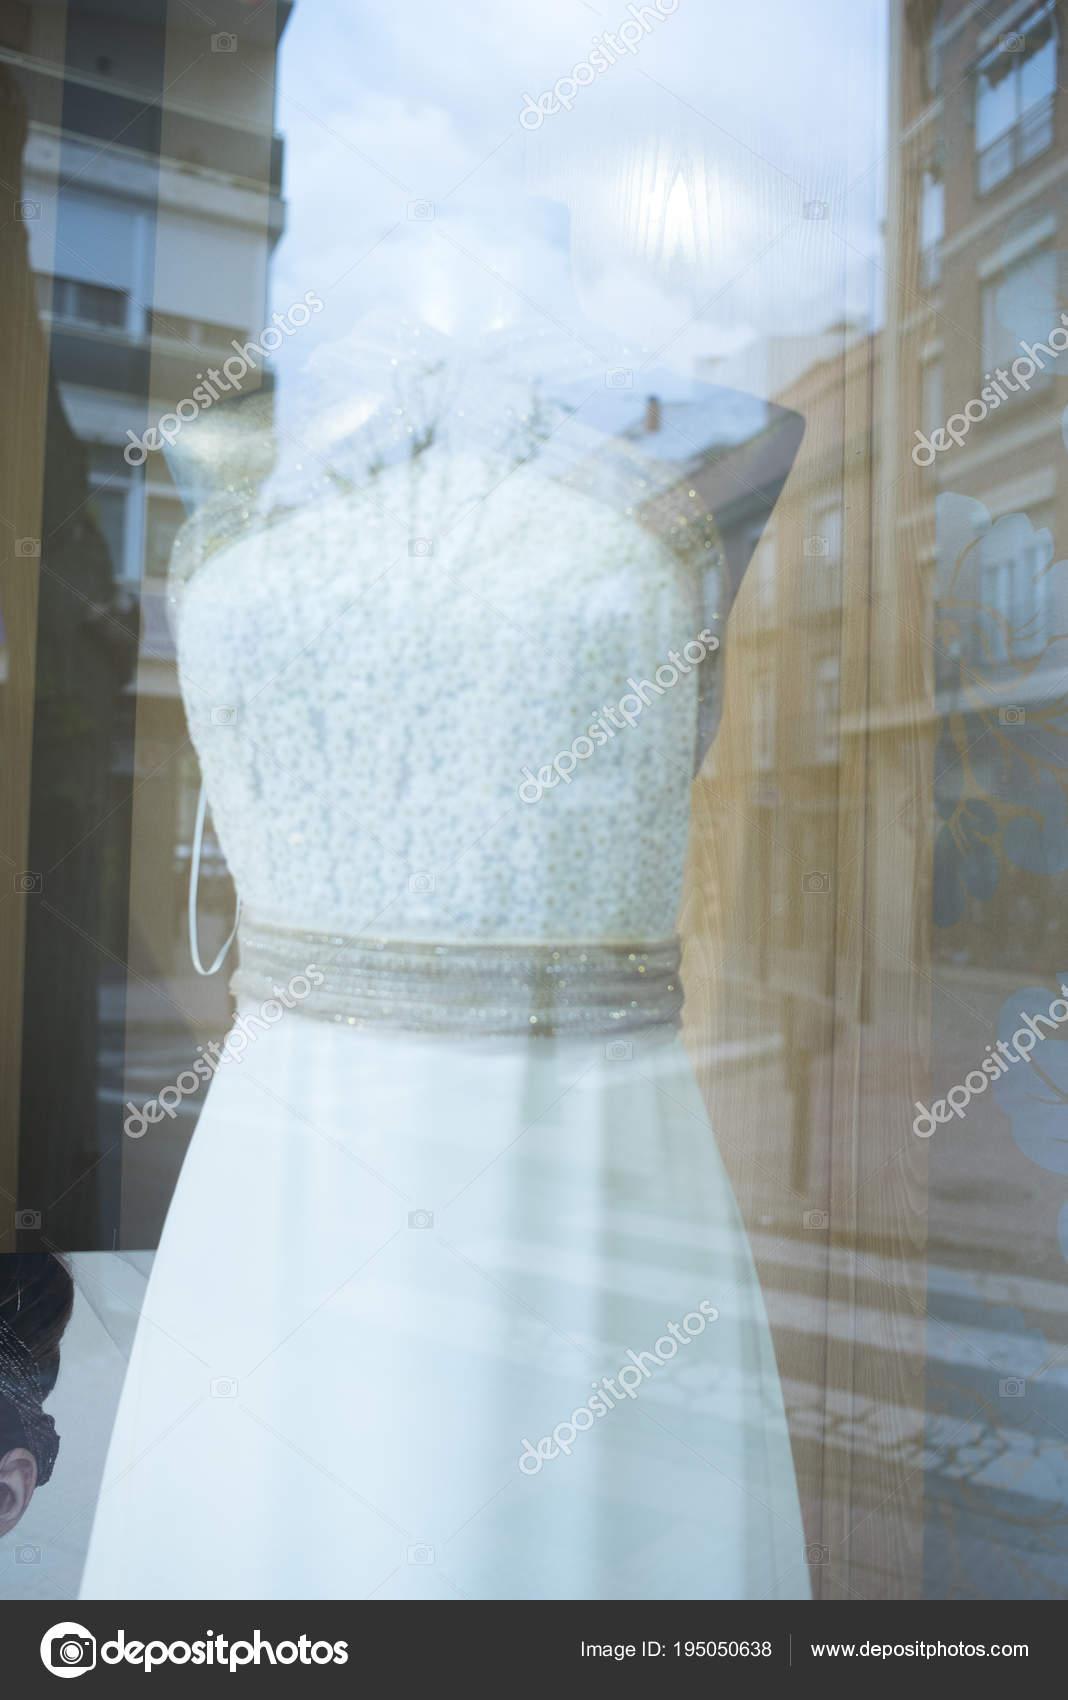 Hochzeit Party Kleid shop — Stockfoto © edwardolive #195050638